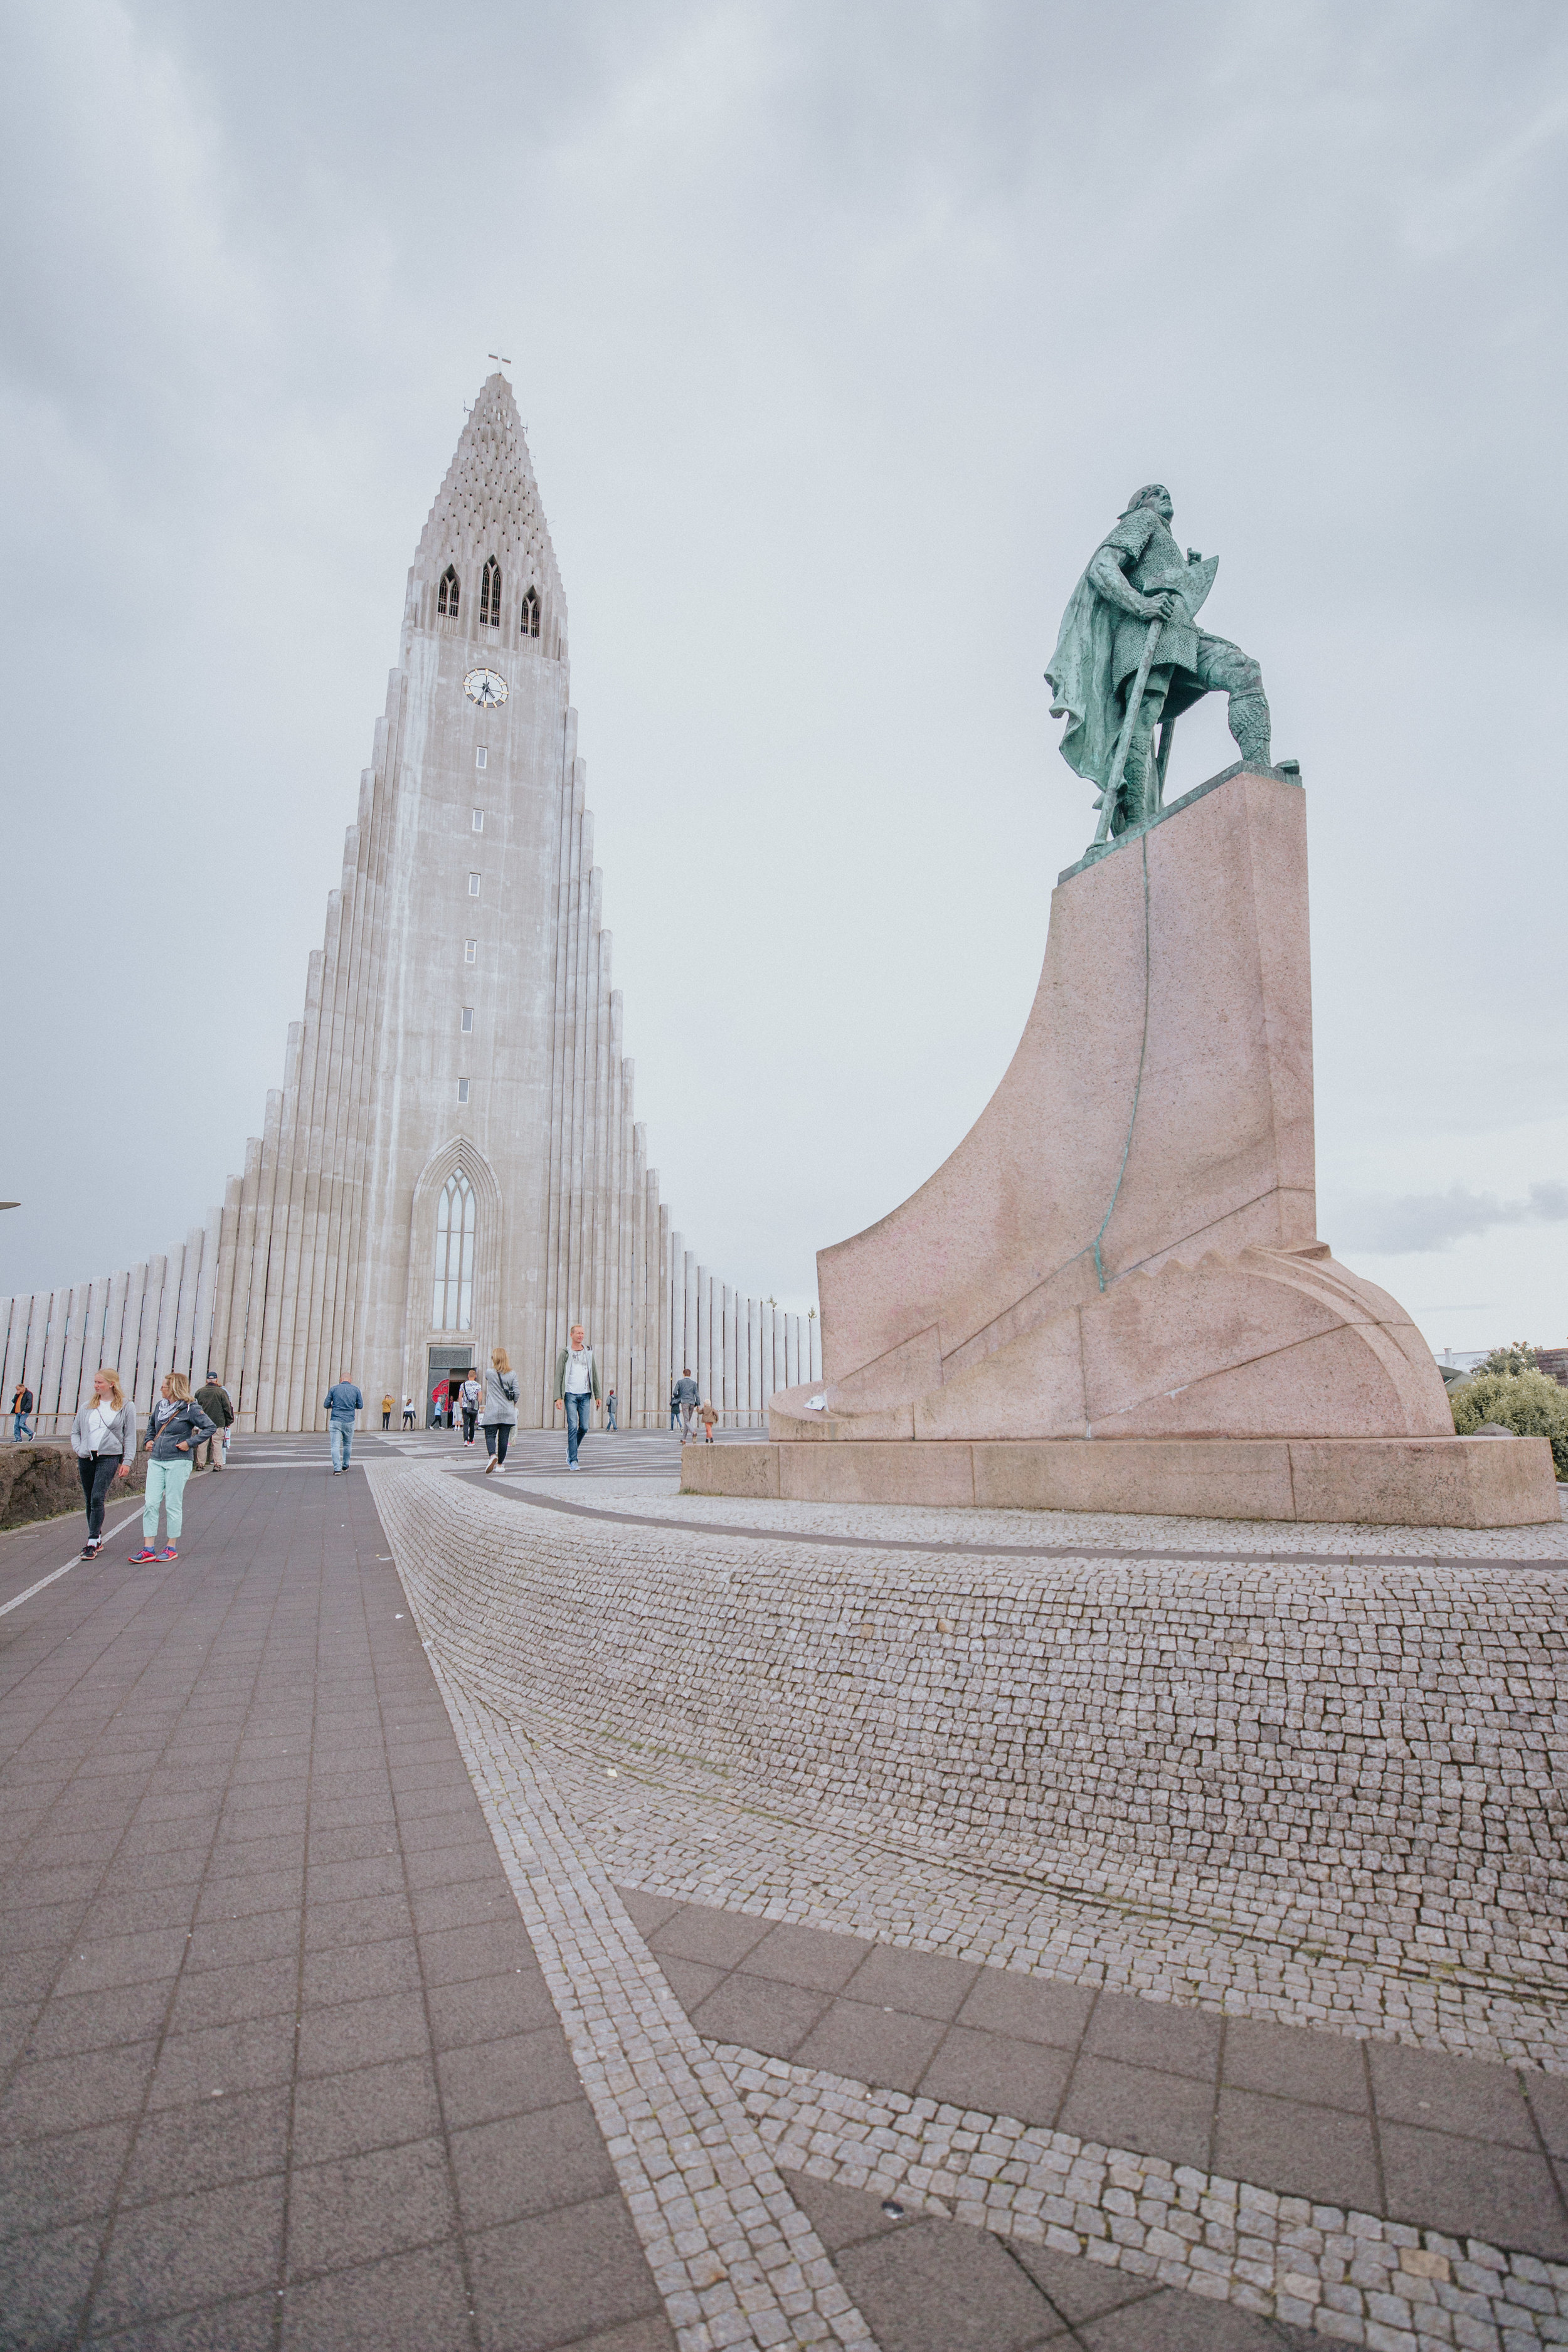 ⛪  Hallgrimskirkja Church  in Reykjavik, Iceland